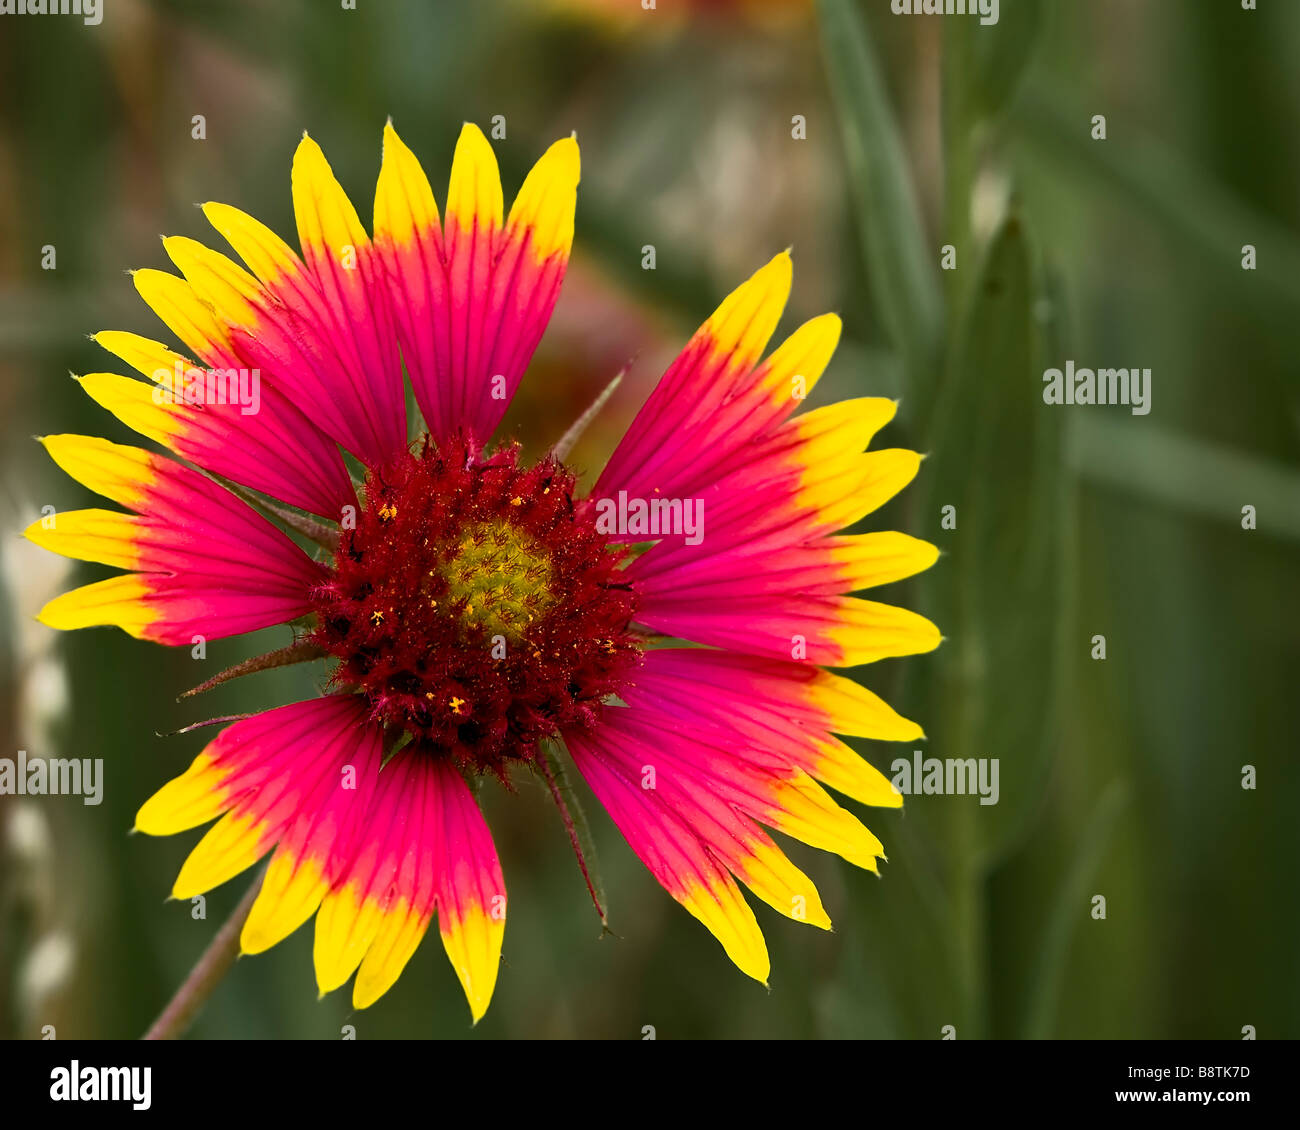 Indian Blanket Wildflower - Stock Image